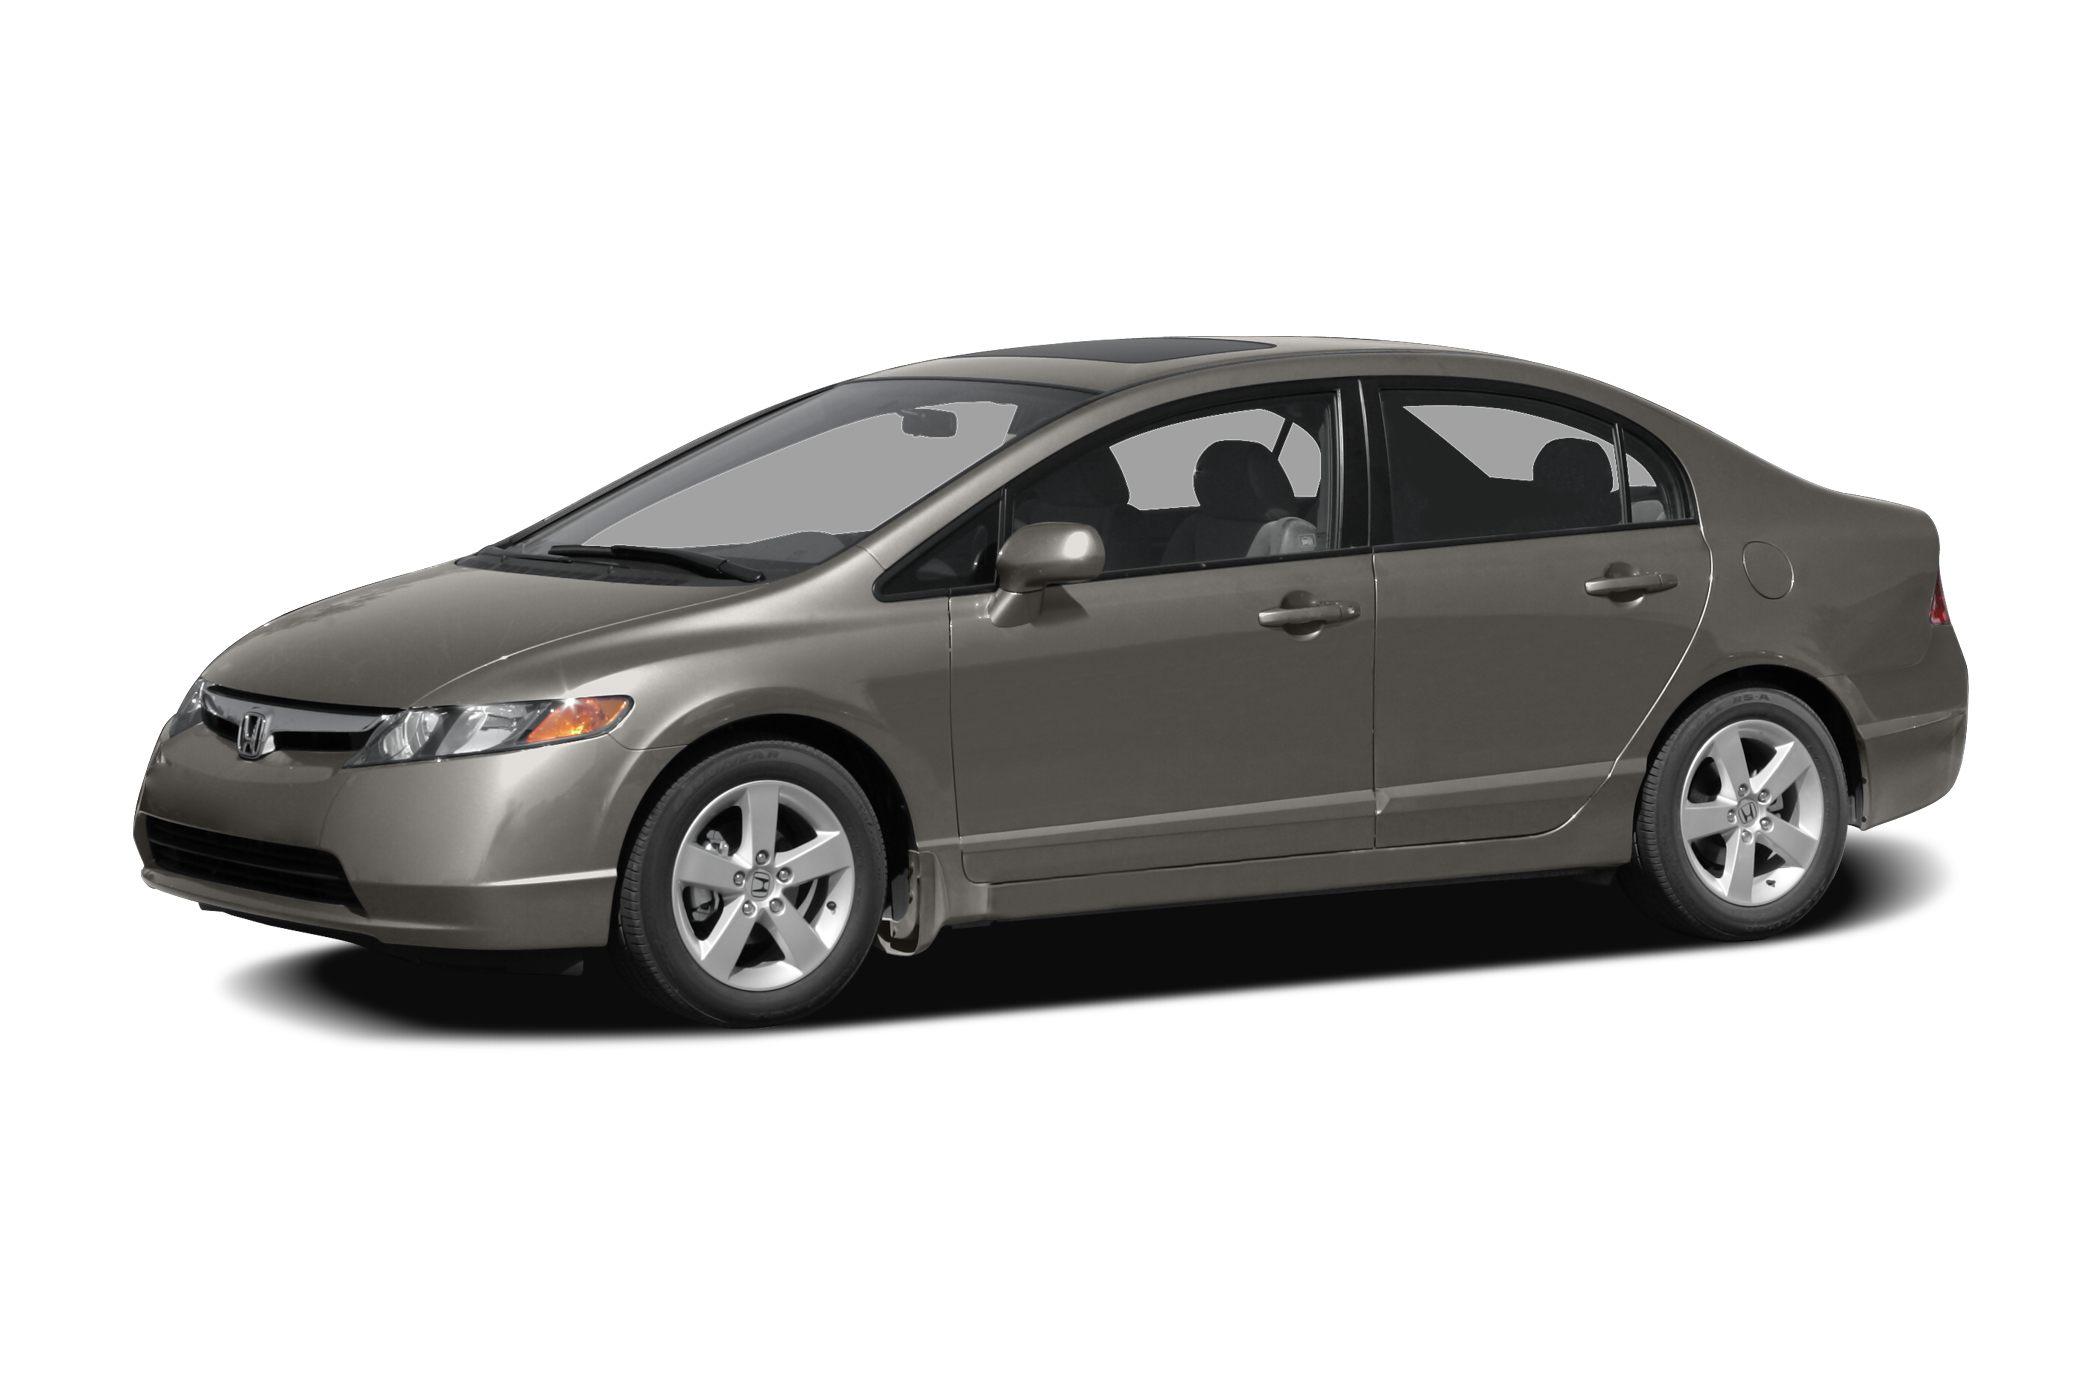 2008 Honda Civic EX Miles 83734Color Silver Stock CU58185A VIN 2HGFA16898H327581